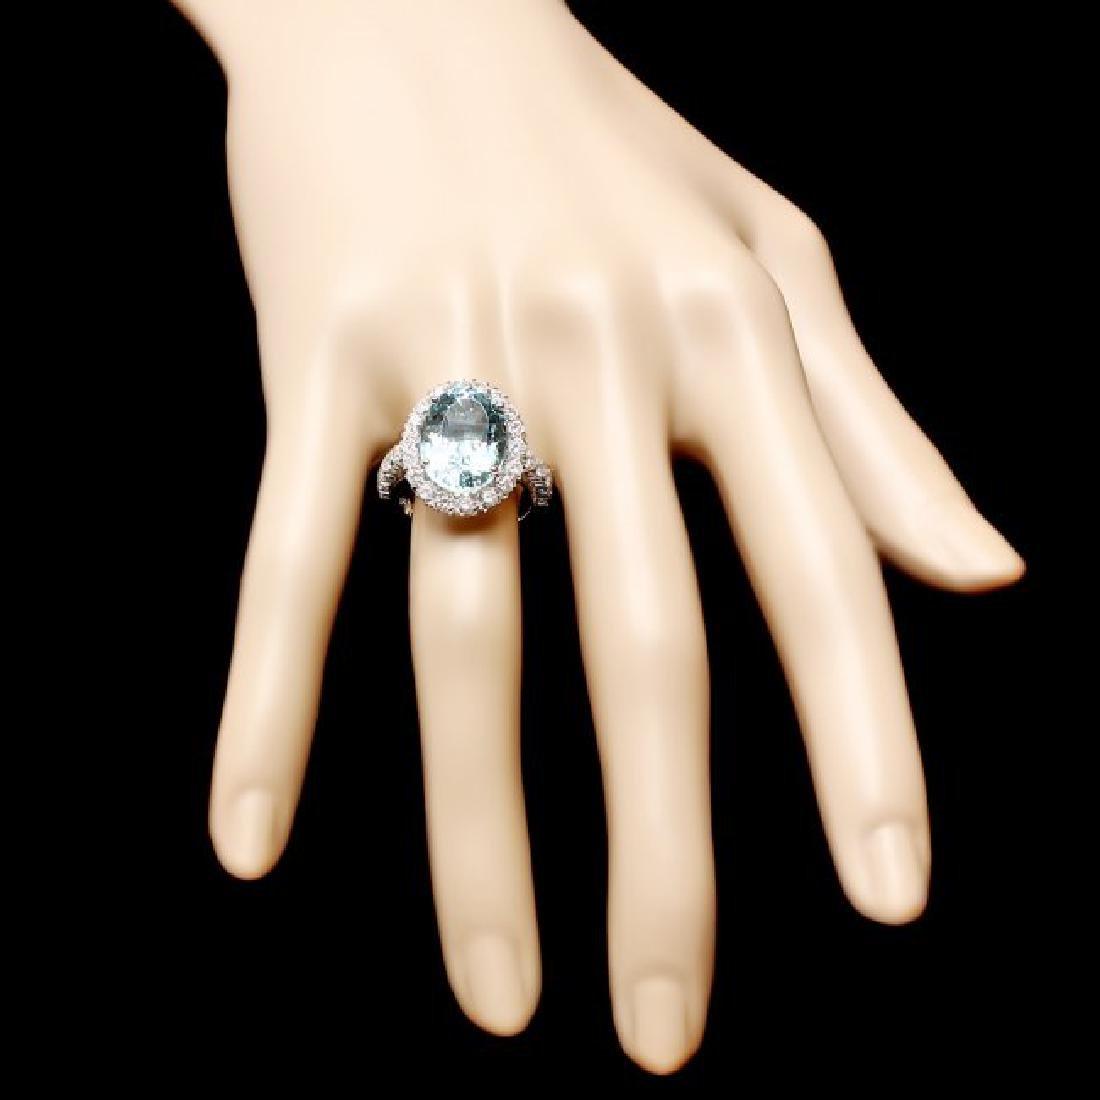 14k Gold 7.70ct Aquamarine 1.27ct Diamond Ring - 4